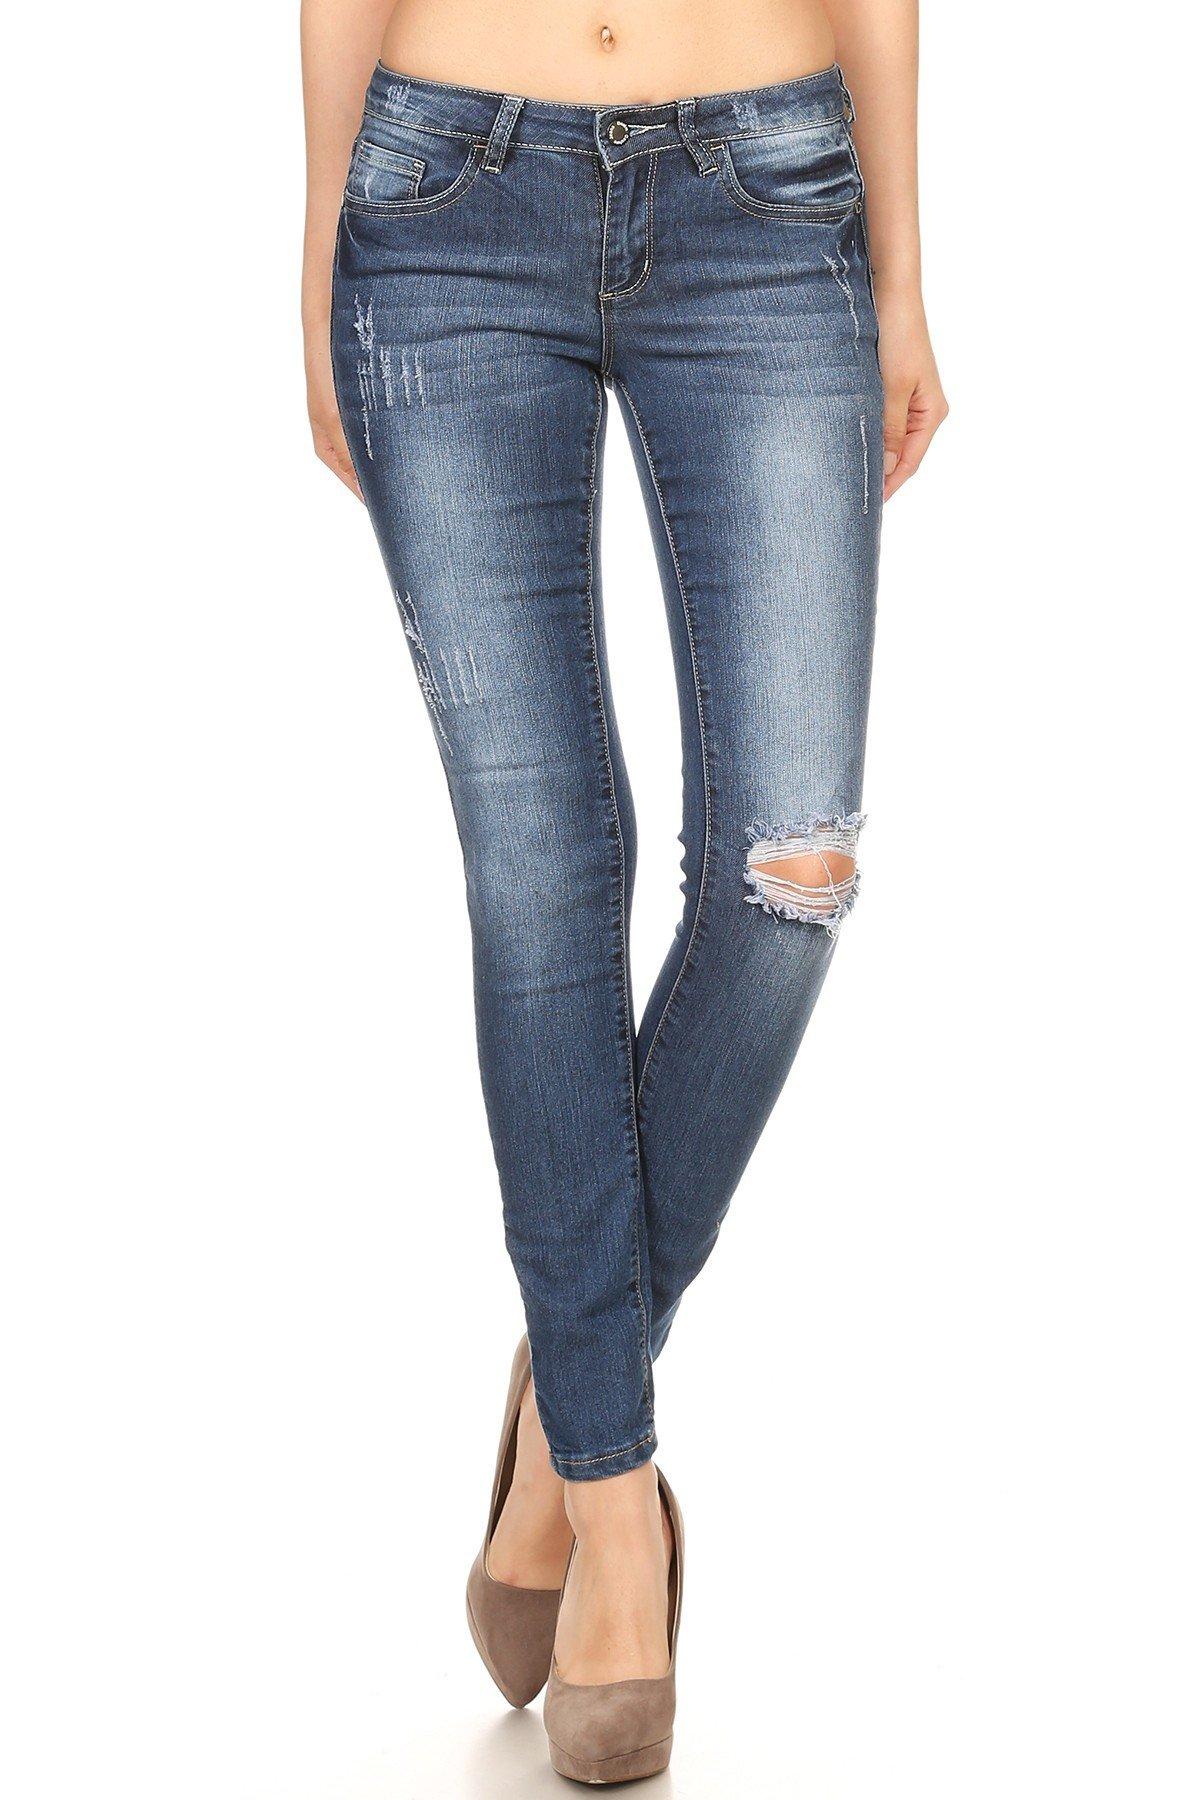 Denim Couture Destroyed Knee Jean 001122